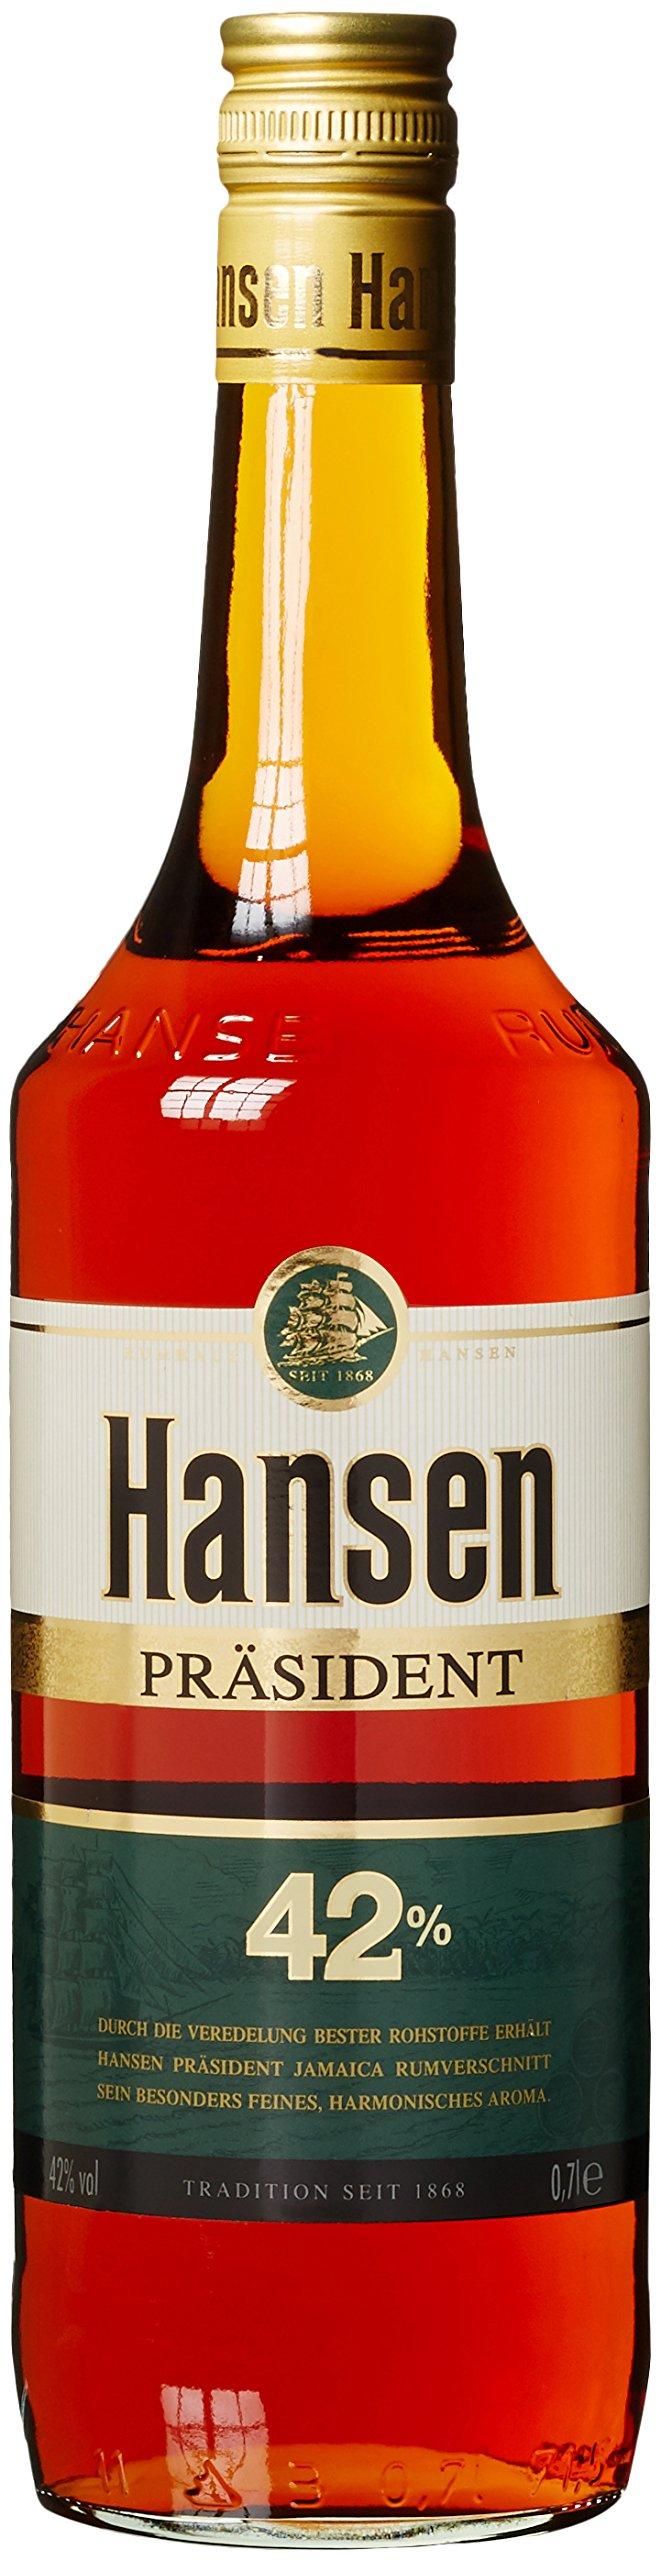 Hansen-Praesident-Rum-1-x-07-l